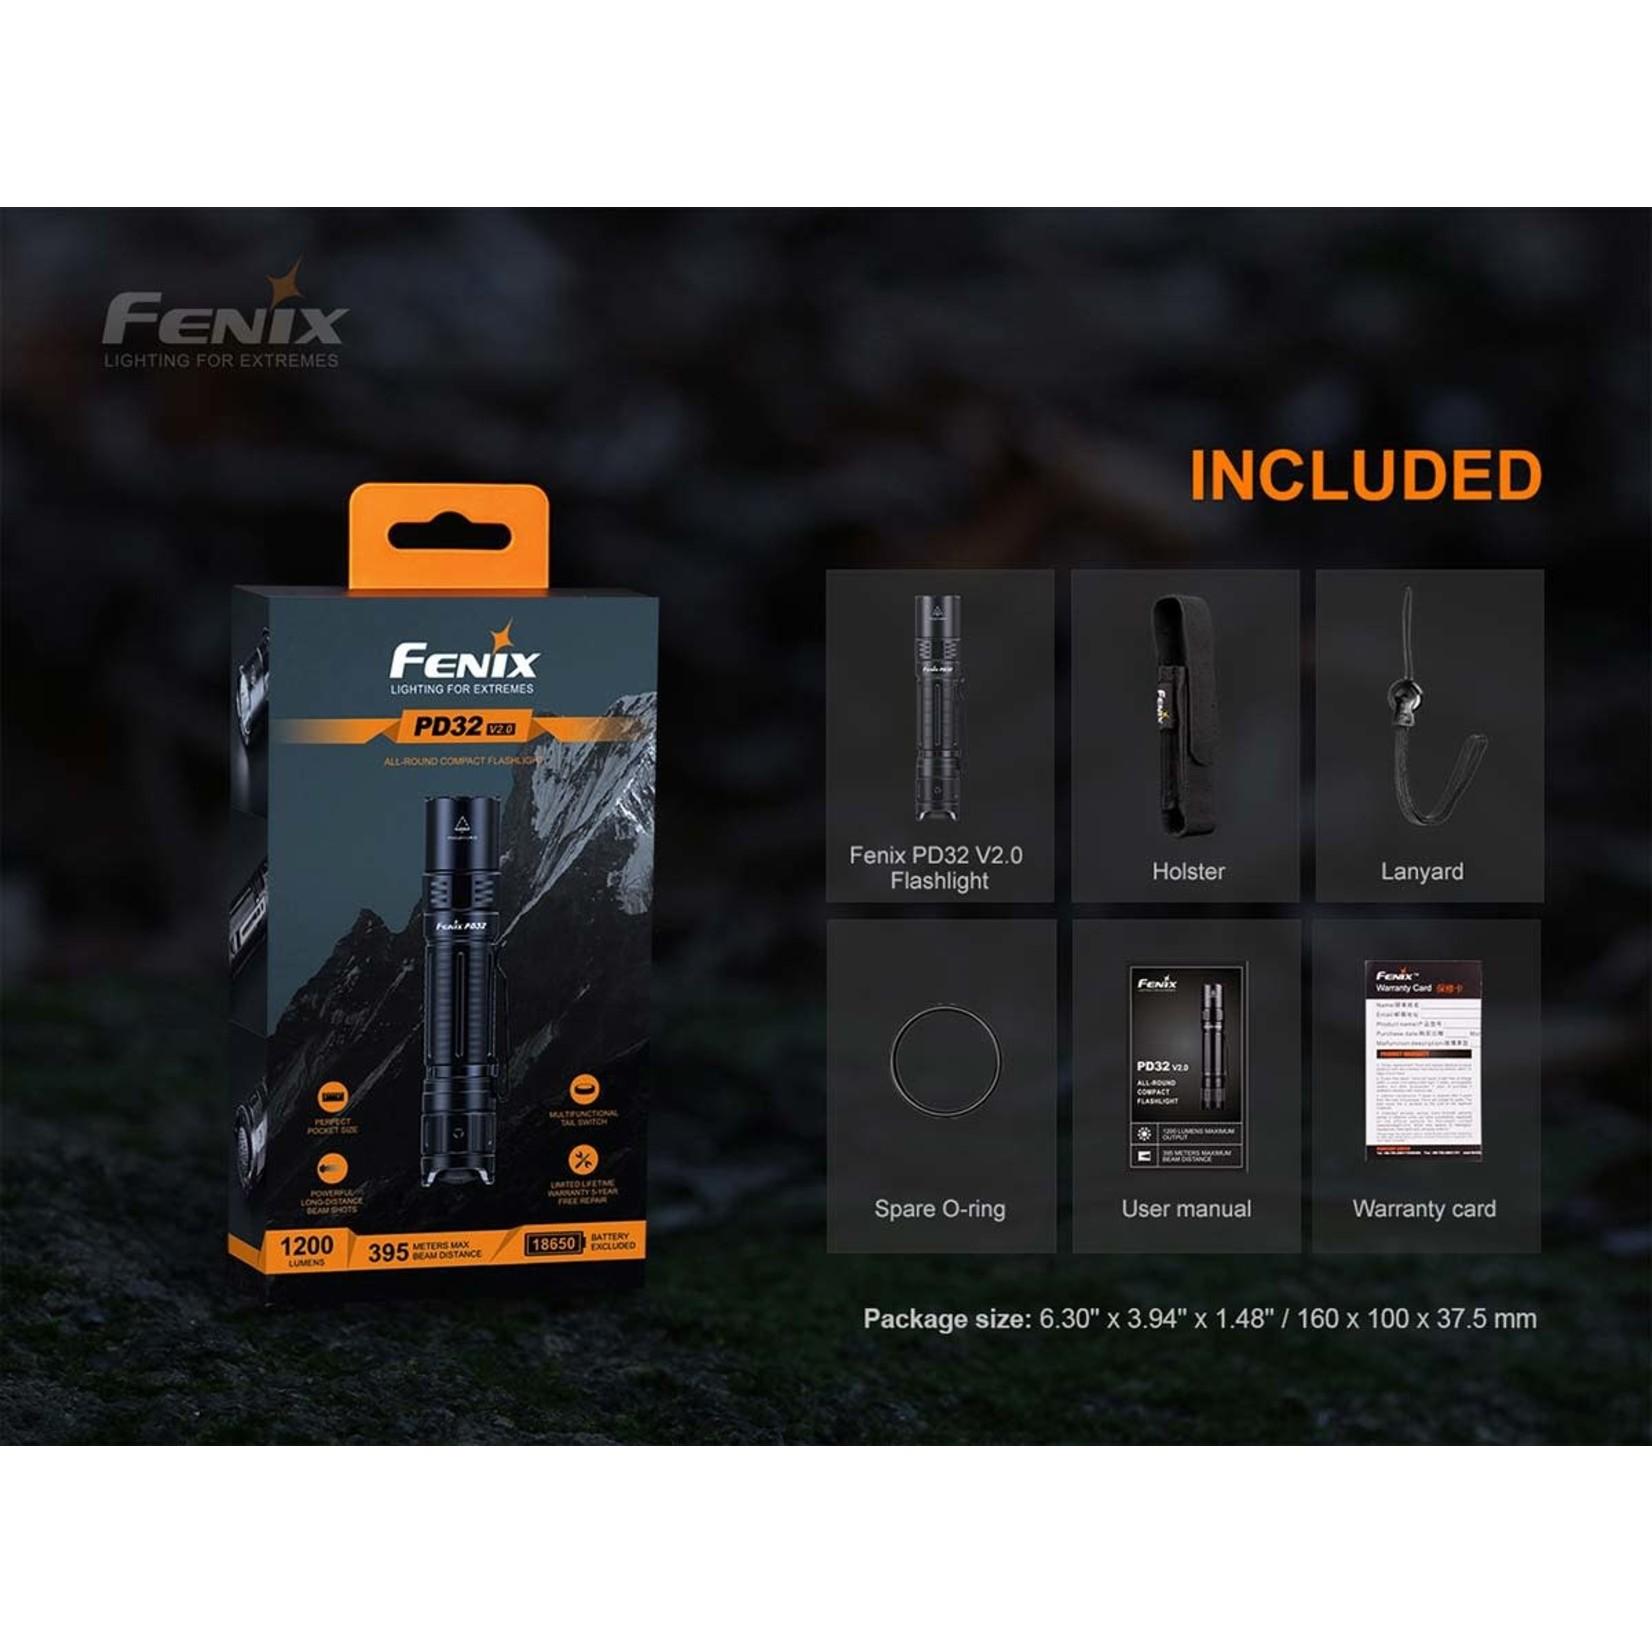 Fenix Fenix PD32 V2.0 All-Round Compact Flashlight